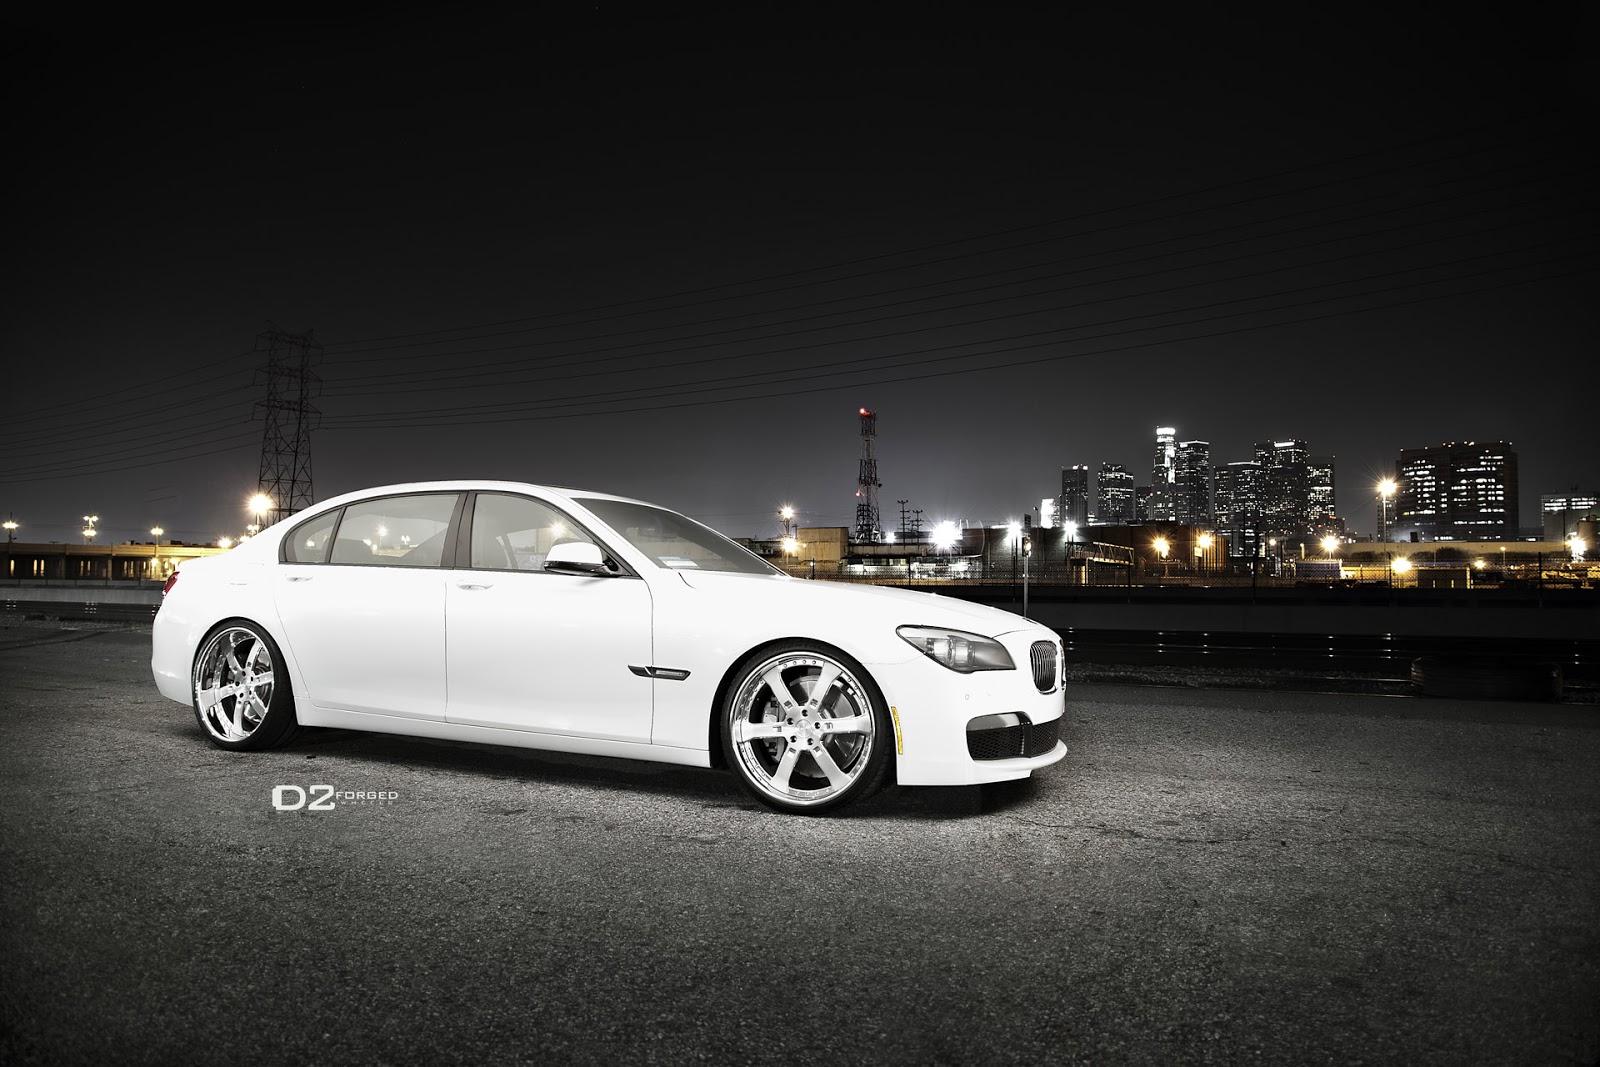 White Land Rover >> Cars GTO: D2Forged BMW 750LI FMS-09